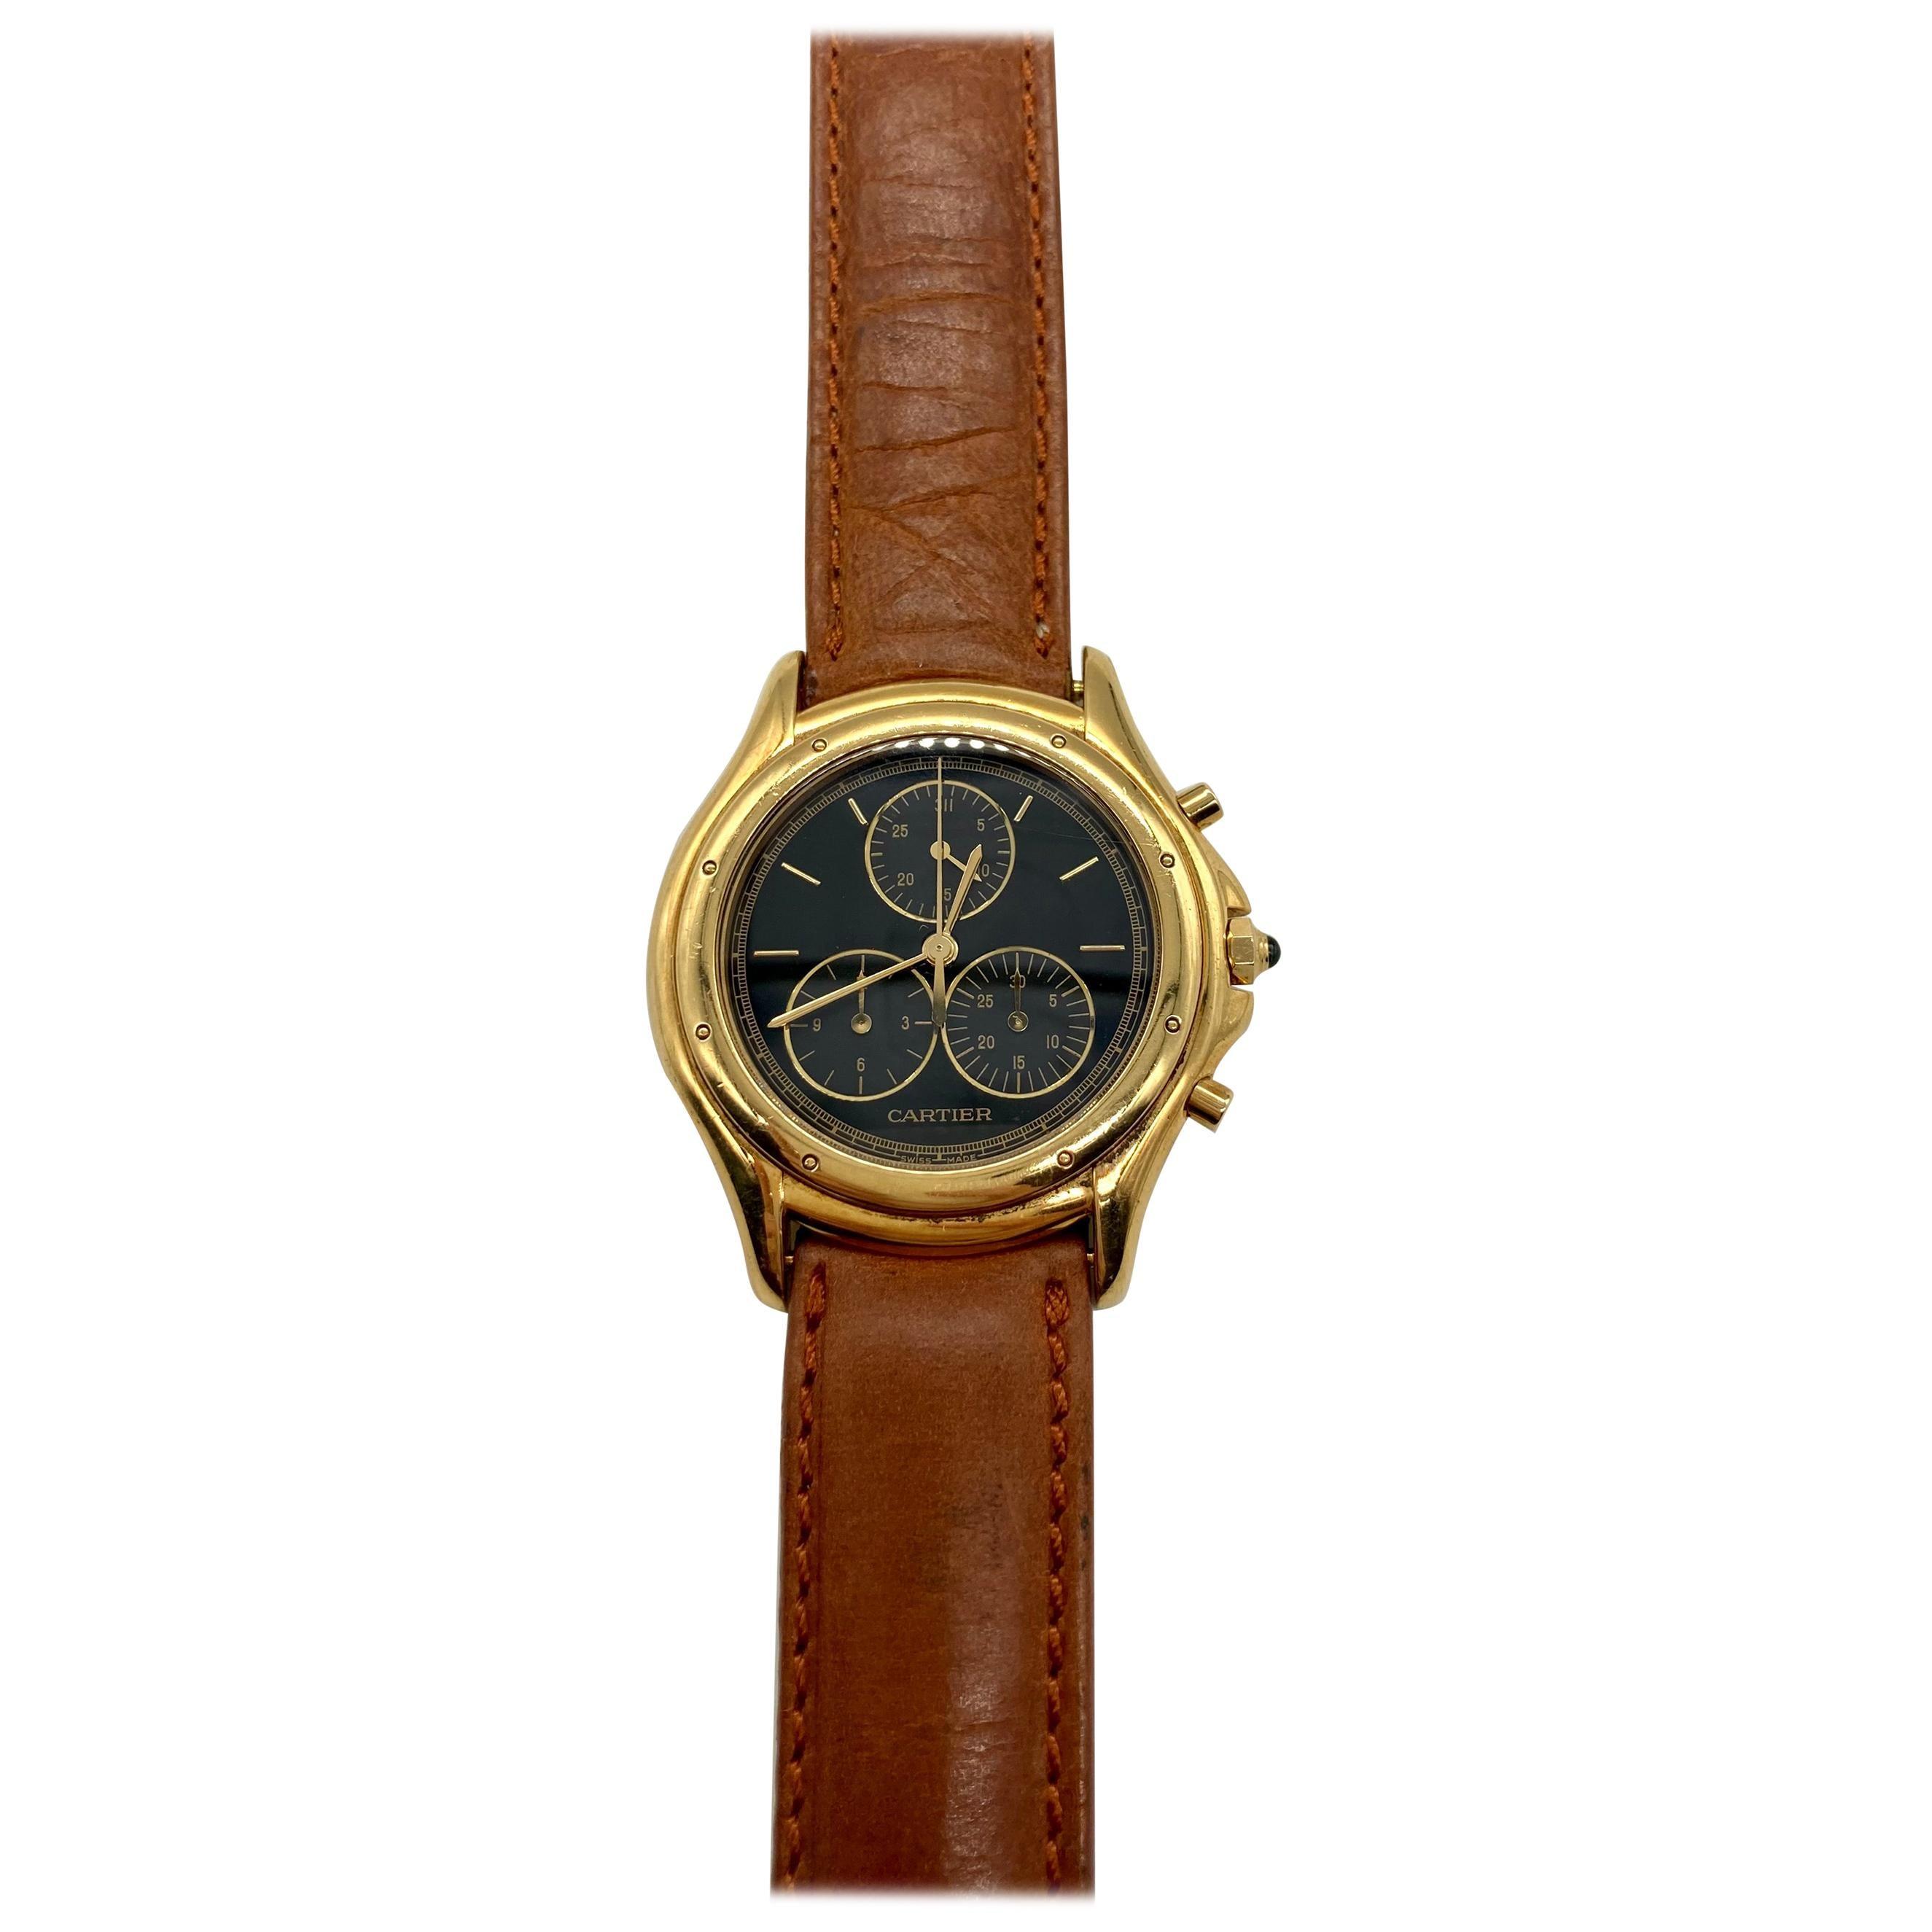 Cartier Quartz Chronograph Yellow Gold Watch